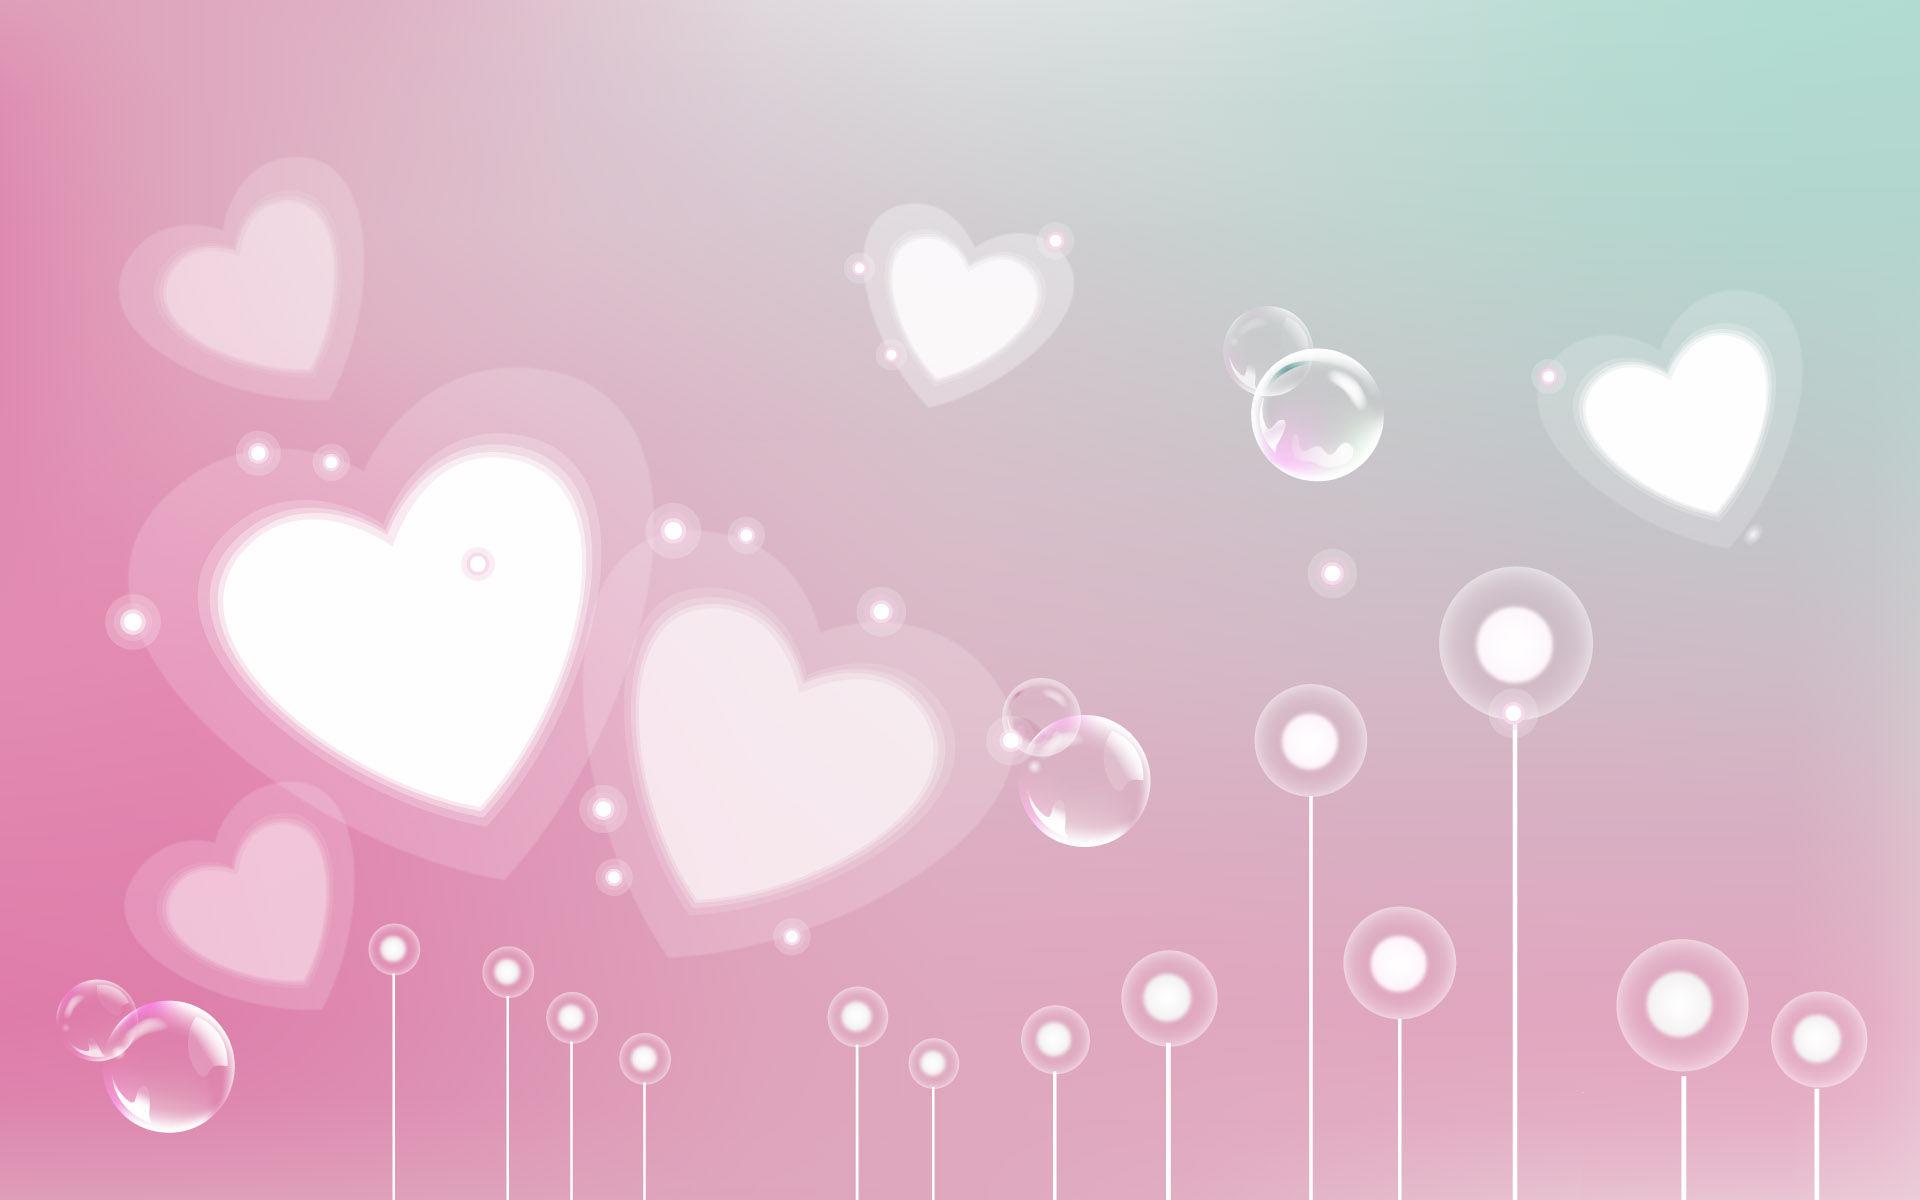 Fonds D'écran St-valentin Cœur - MaximumWallHD